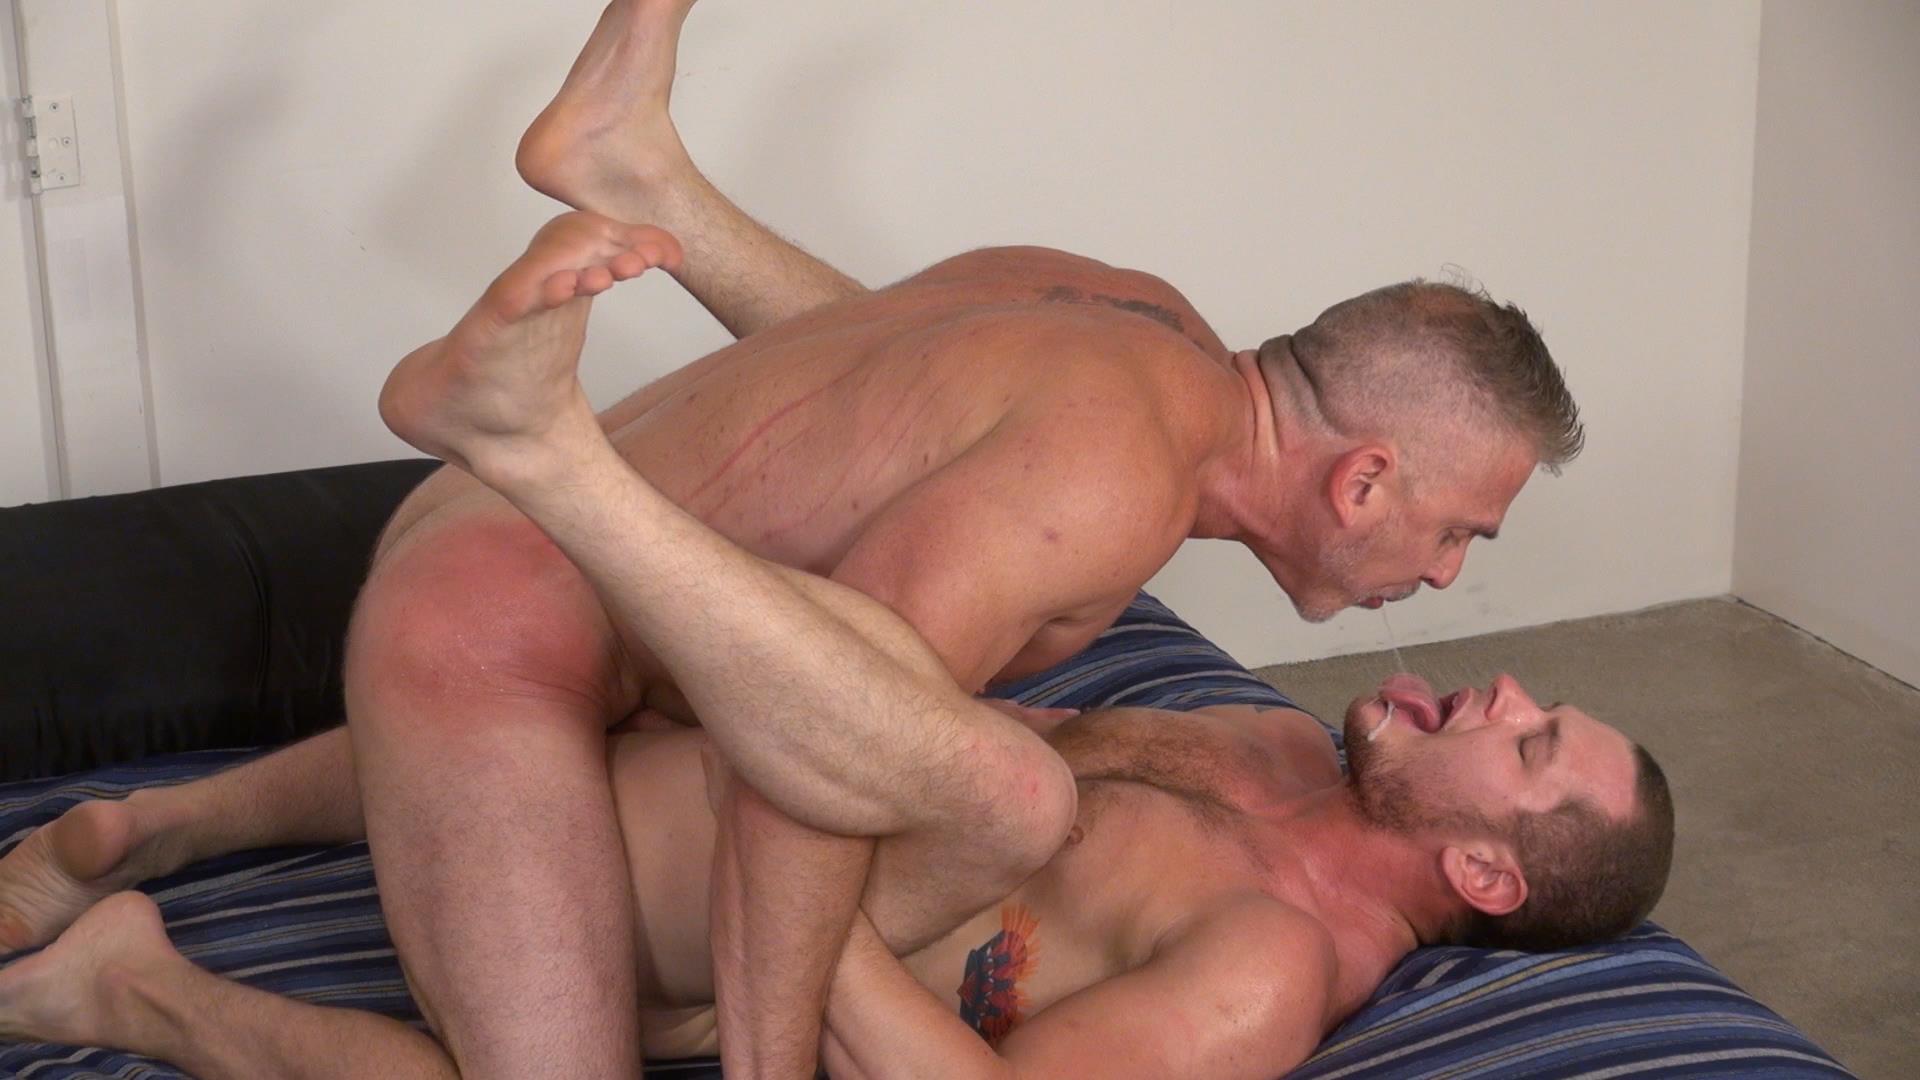 Raw-and-Rough-Sam-Dixon-and-Blue-Bailey-Daddy-And-Boy-Flip-Flip-Bareback-Fucking-Amateur-Gay-Porn-06 Blue Bailey Flip Flop Barebacking With A Hung Daddy